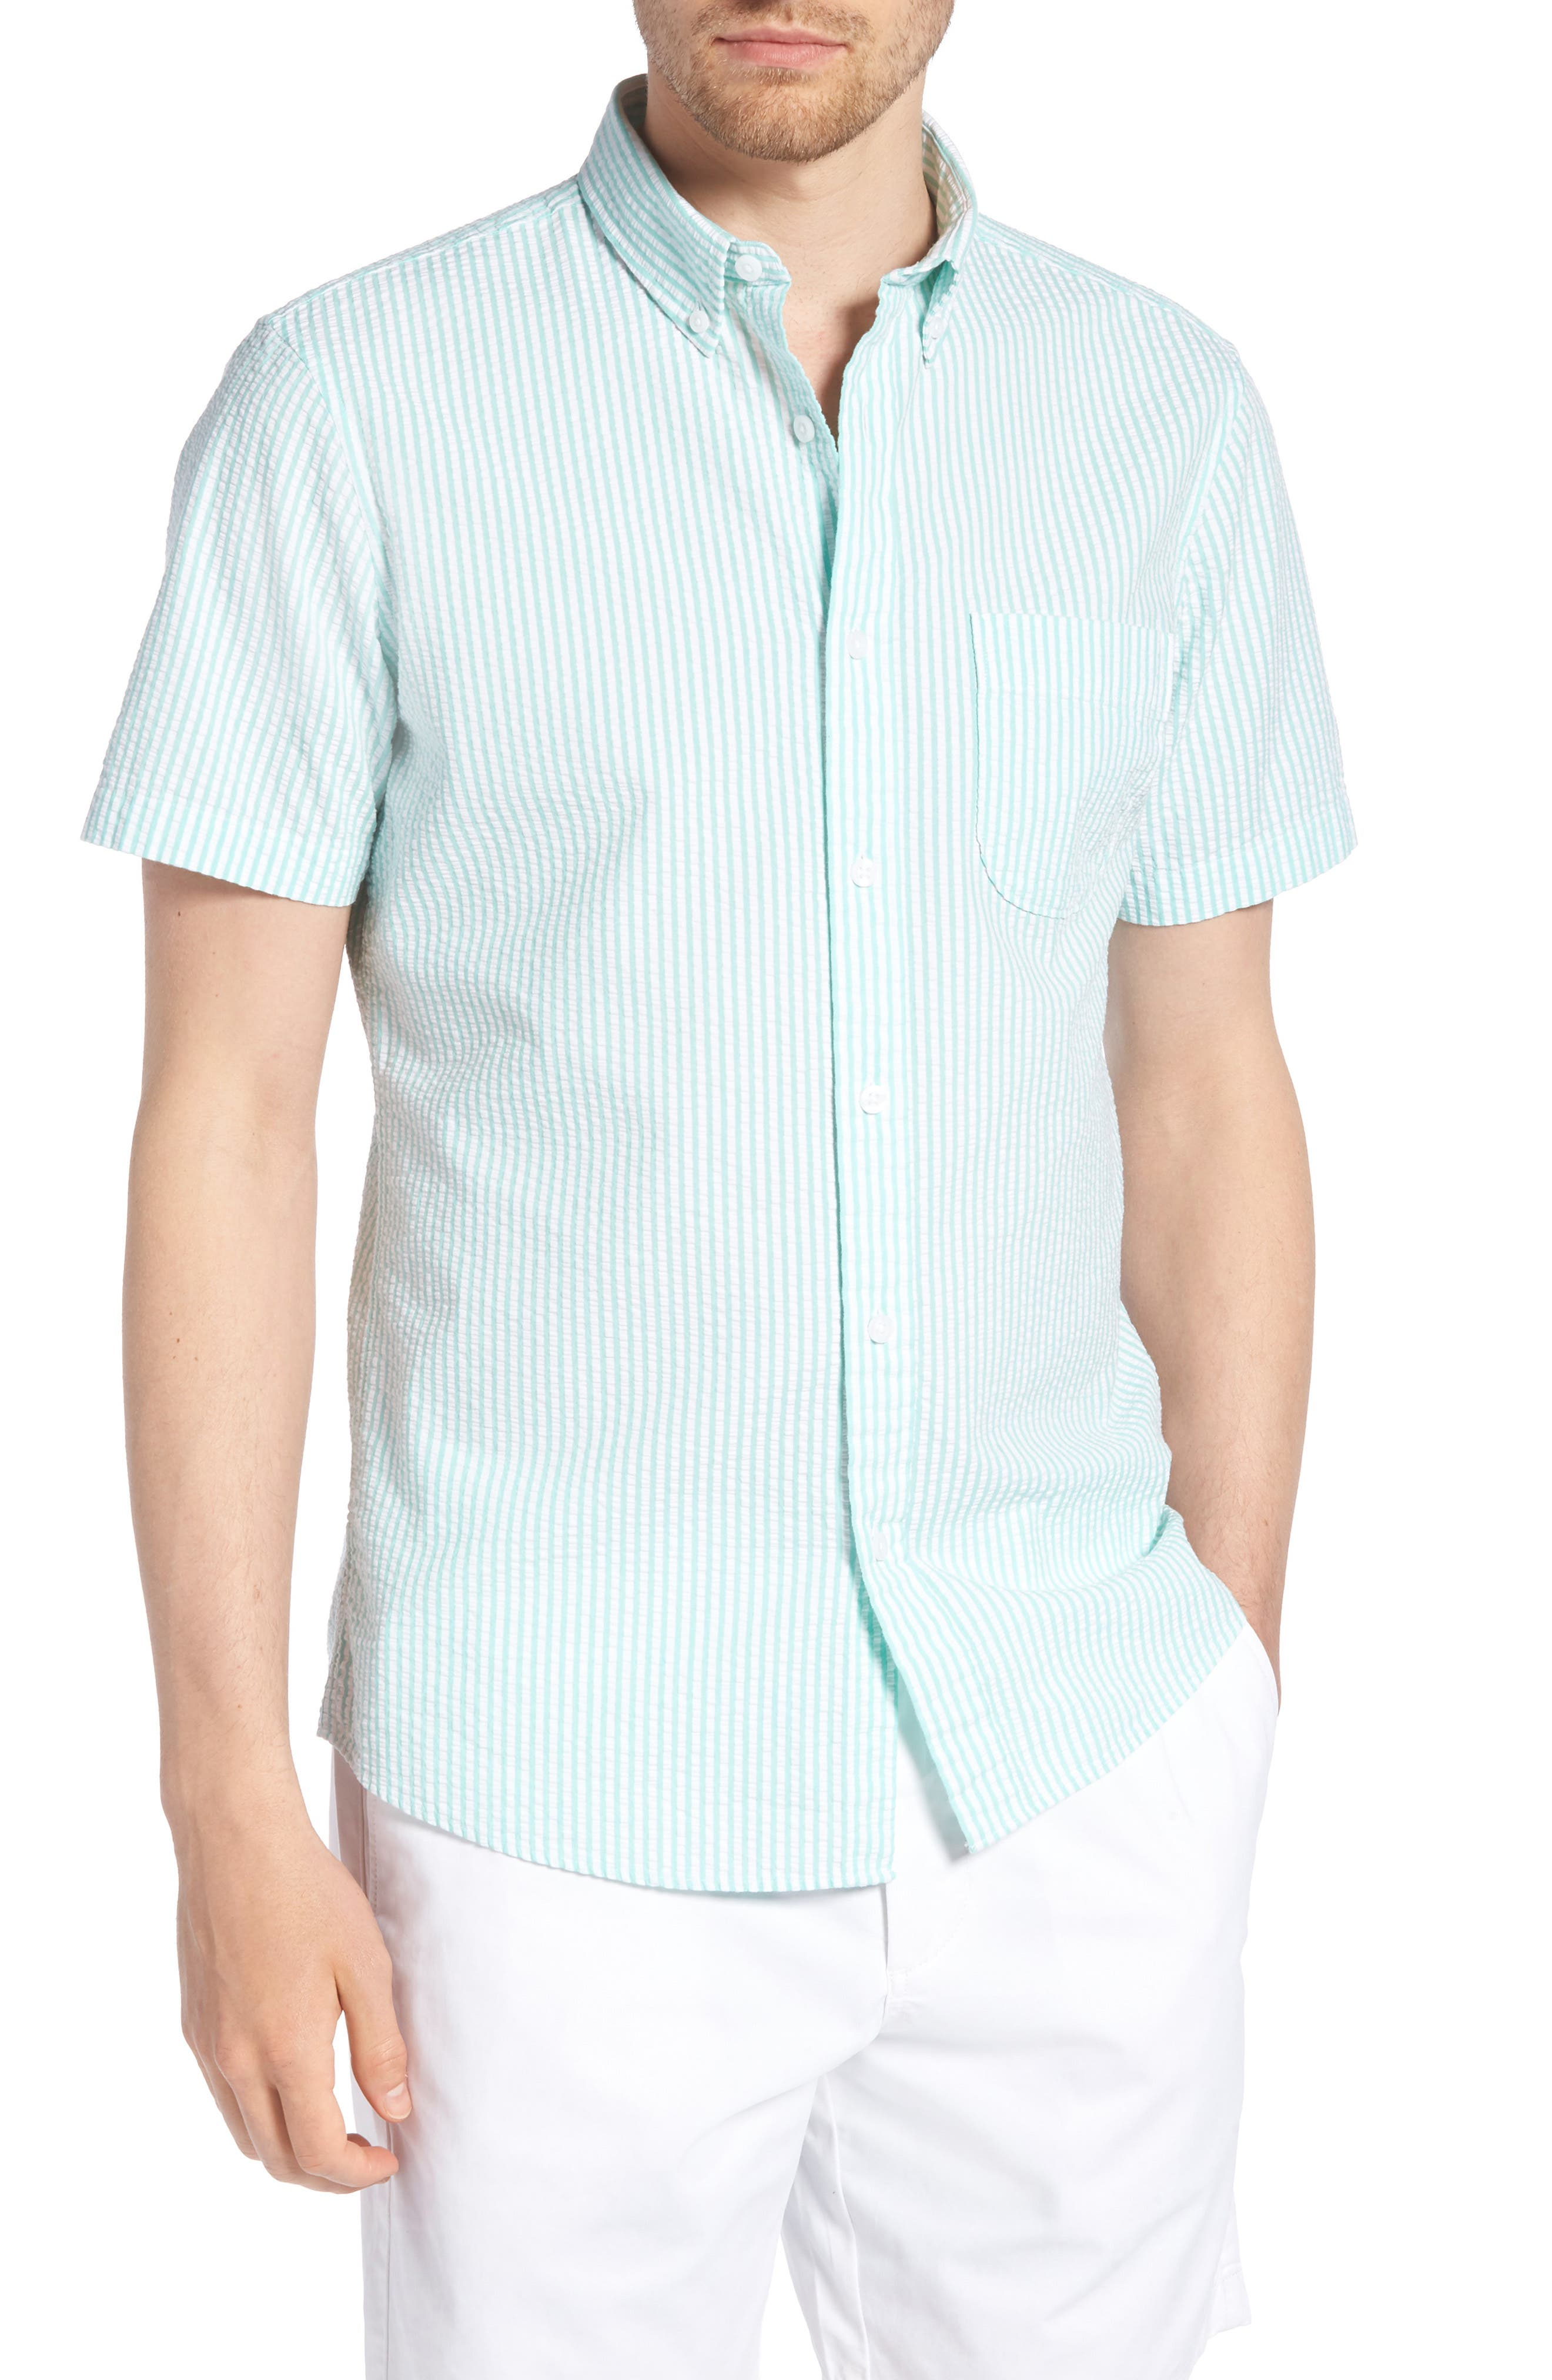 Trim Fit Seersucker Short Sleeve Sport Shirt,                         Main,                         color, White Green Seersucker Stripe